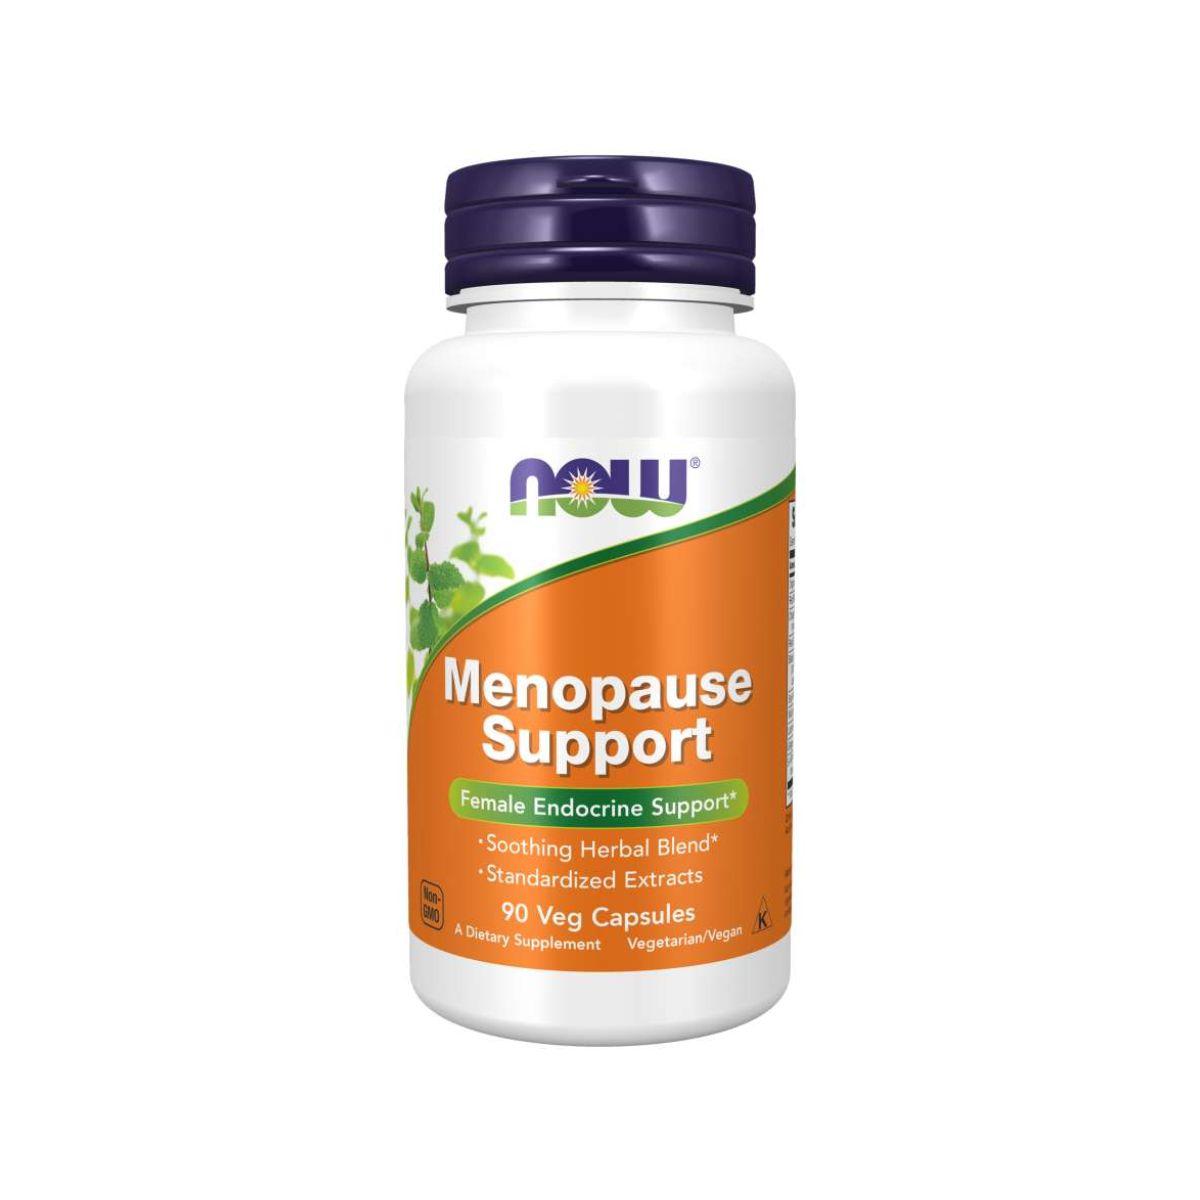 Menopause Support Female Endocrine 90Caps - Now Foods